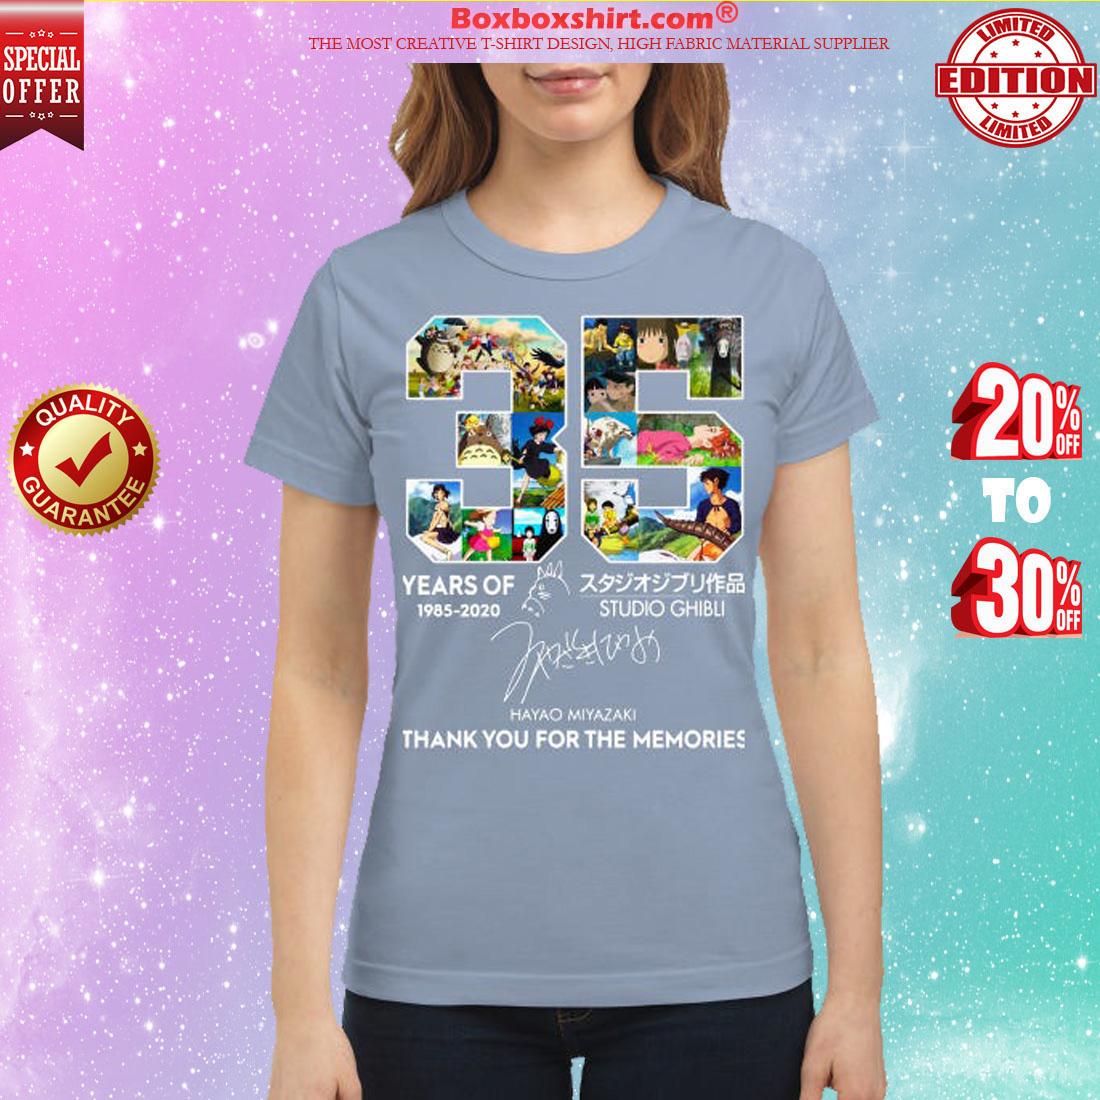 35 year of Studio Ghibli Hayao Miyazaki shirt